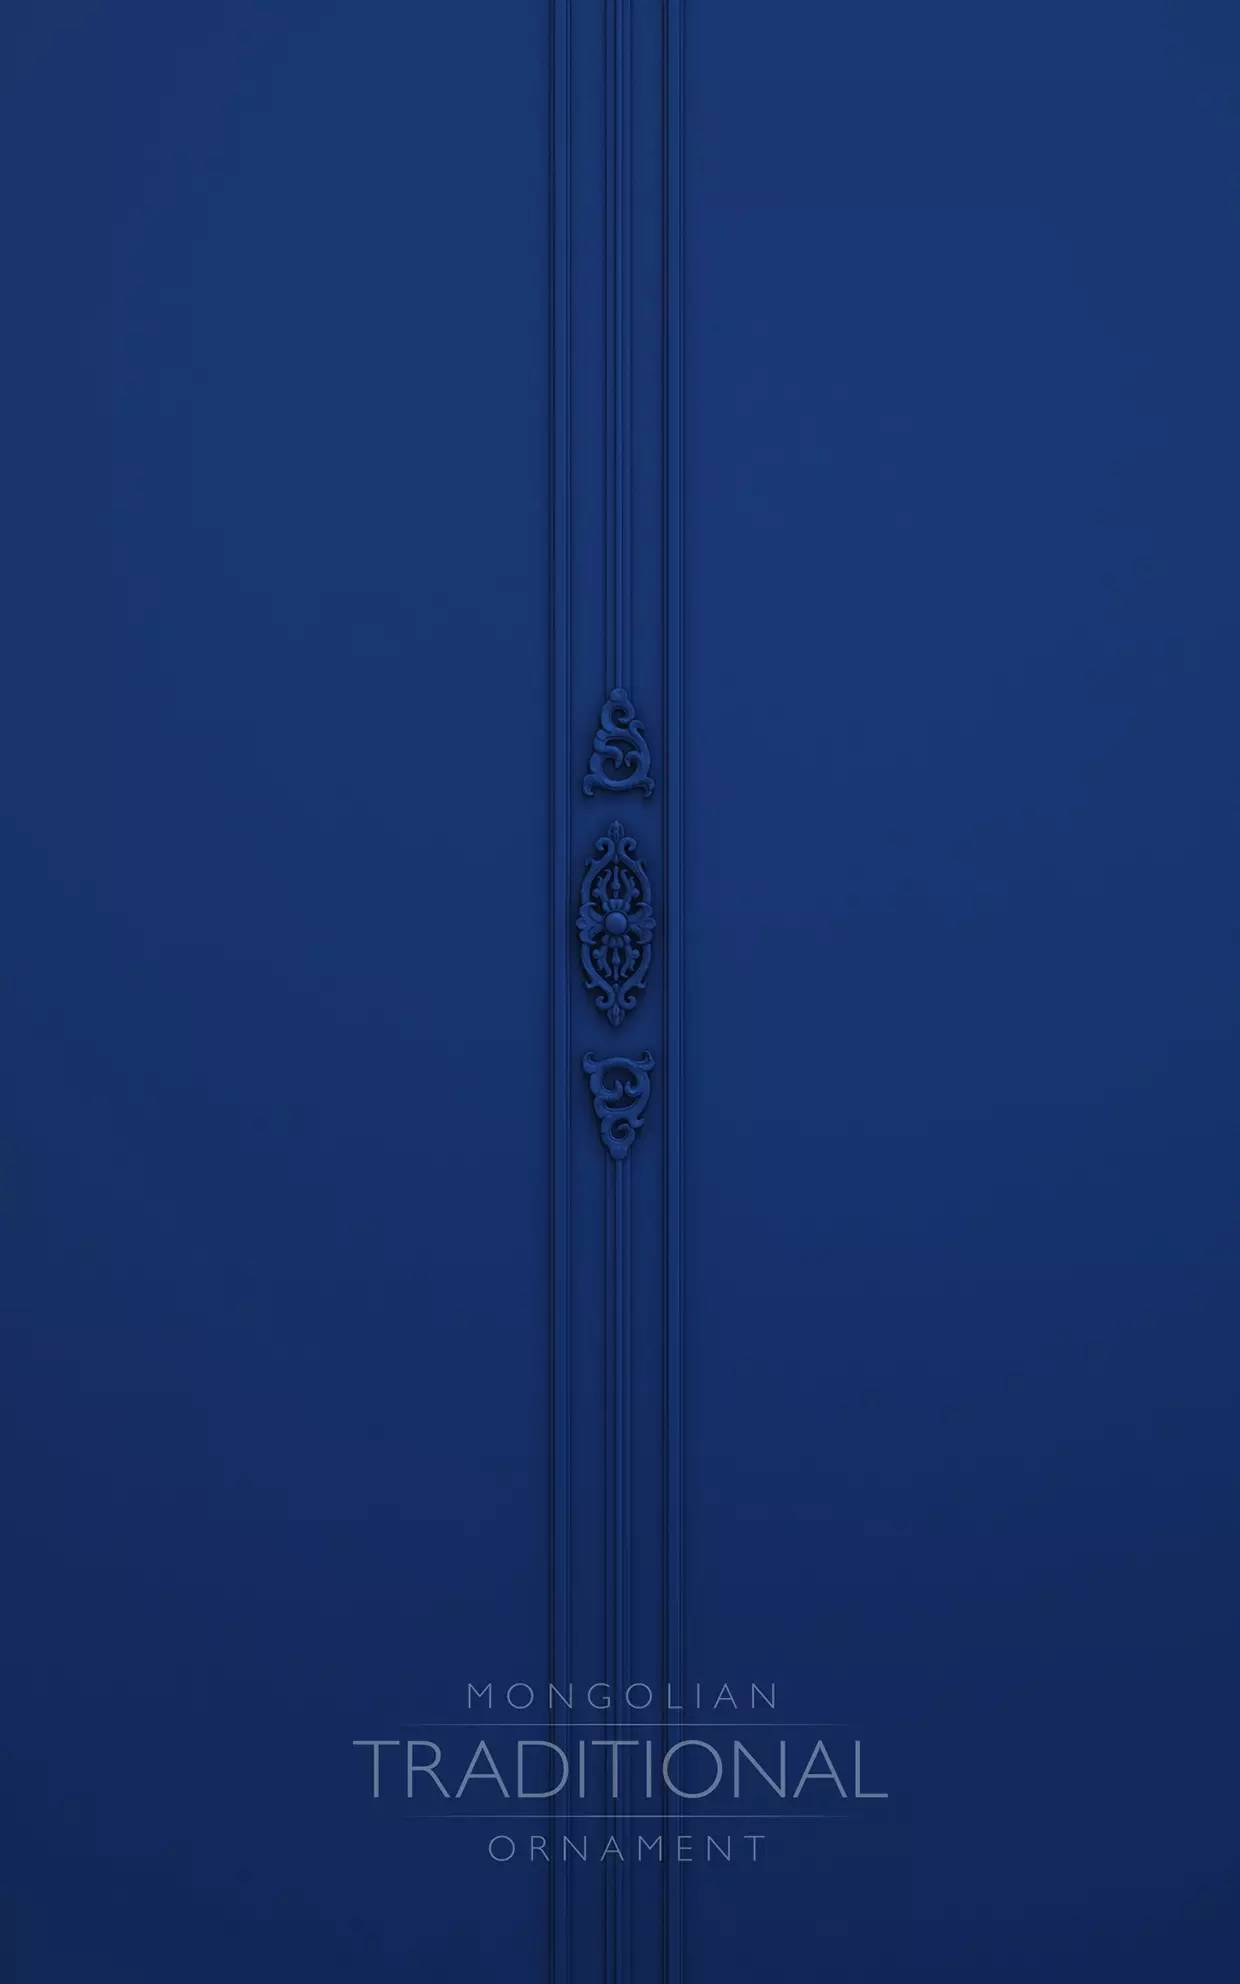 室内设计 蒙族传统装饰(Mongolian Traditional Ornament) 第9张